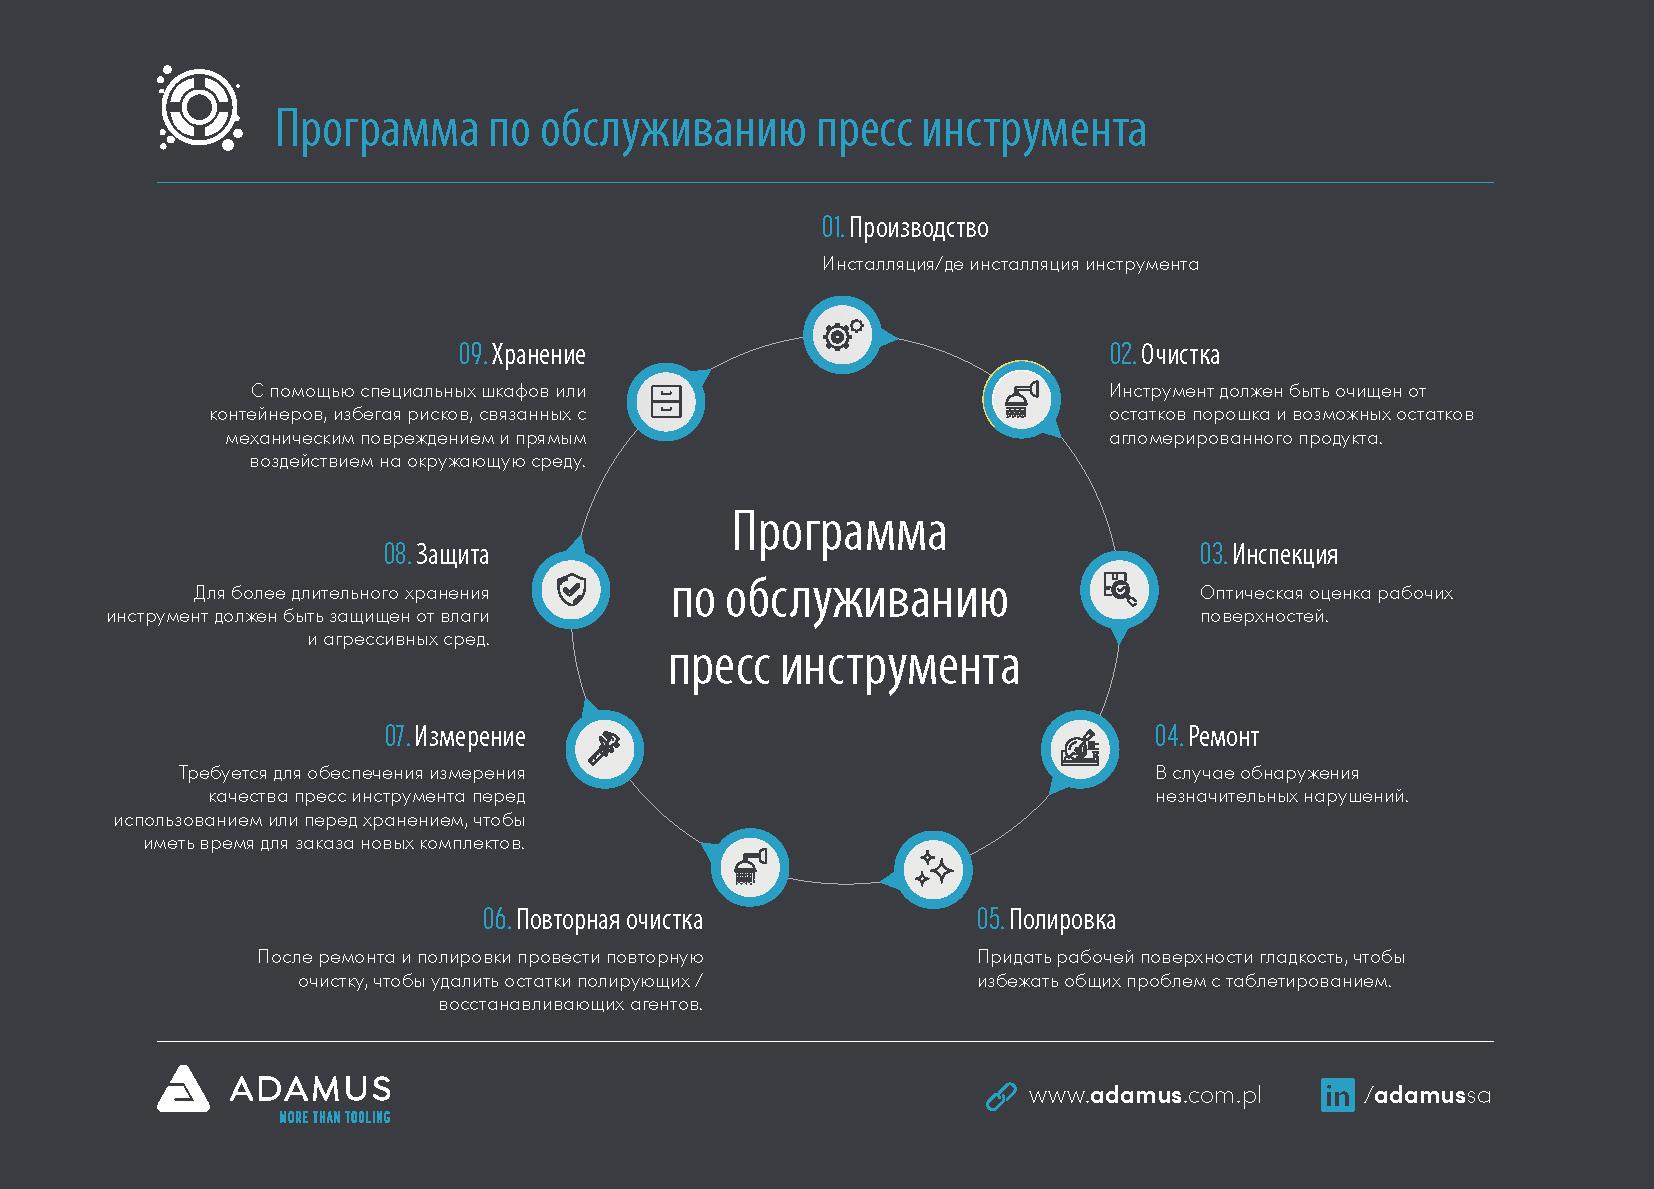 Tool Maintenance Program by Adamus RU